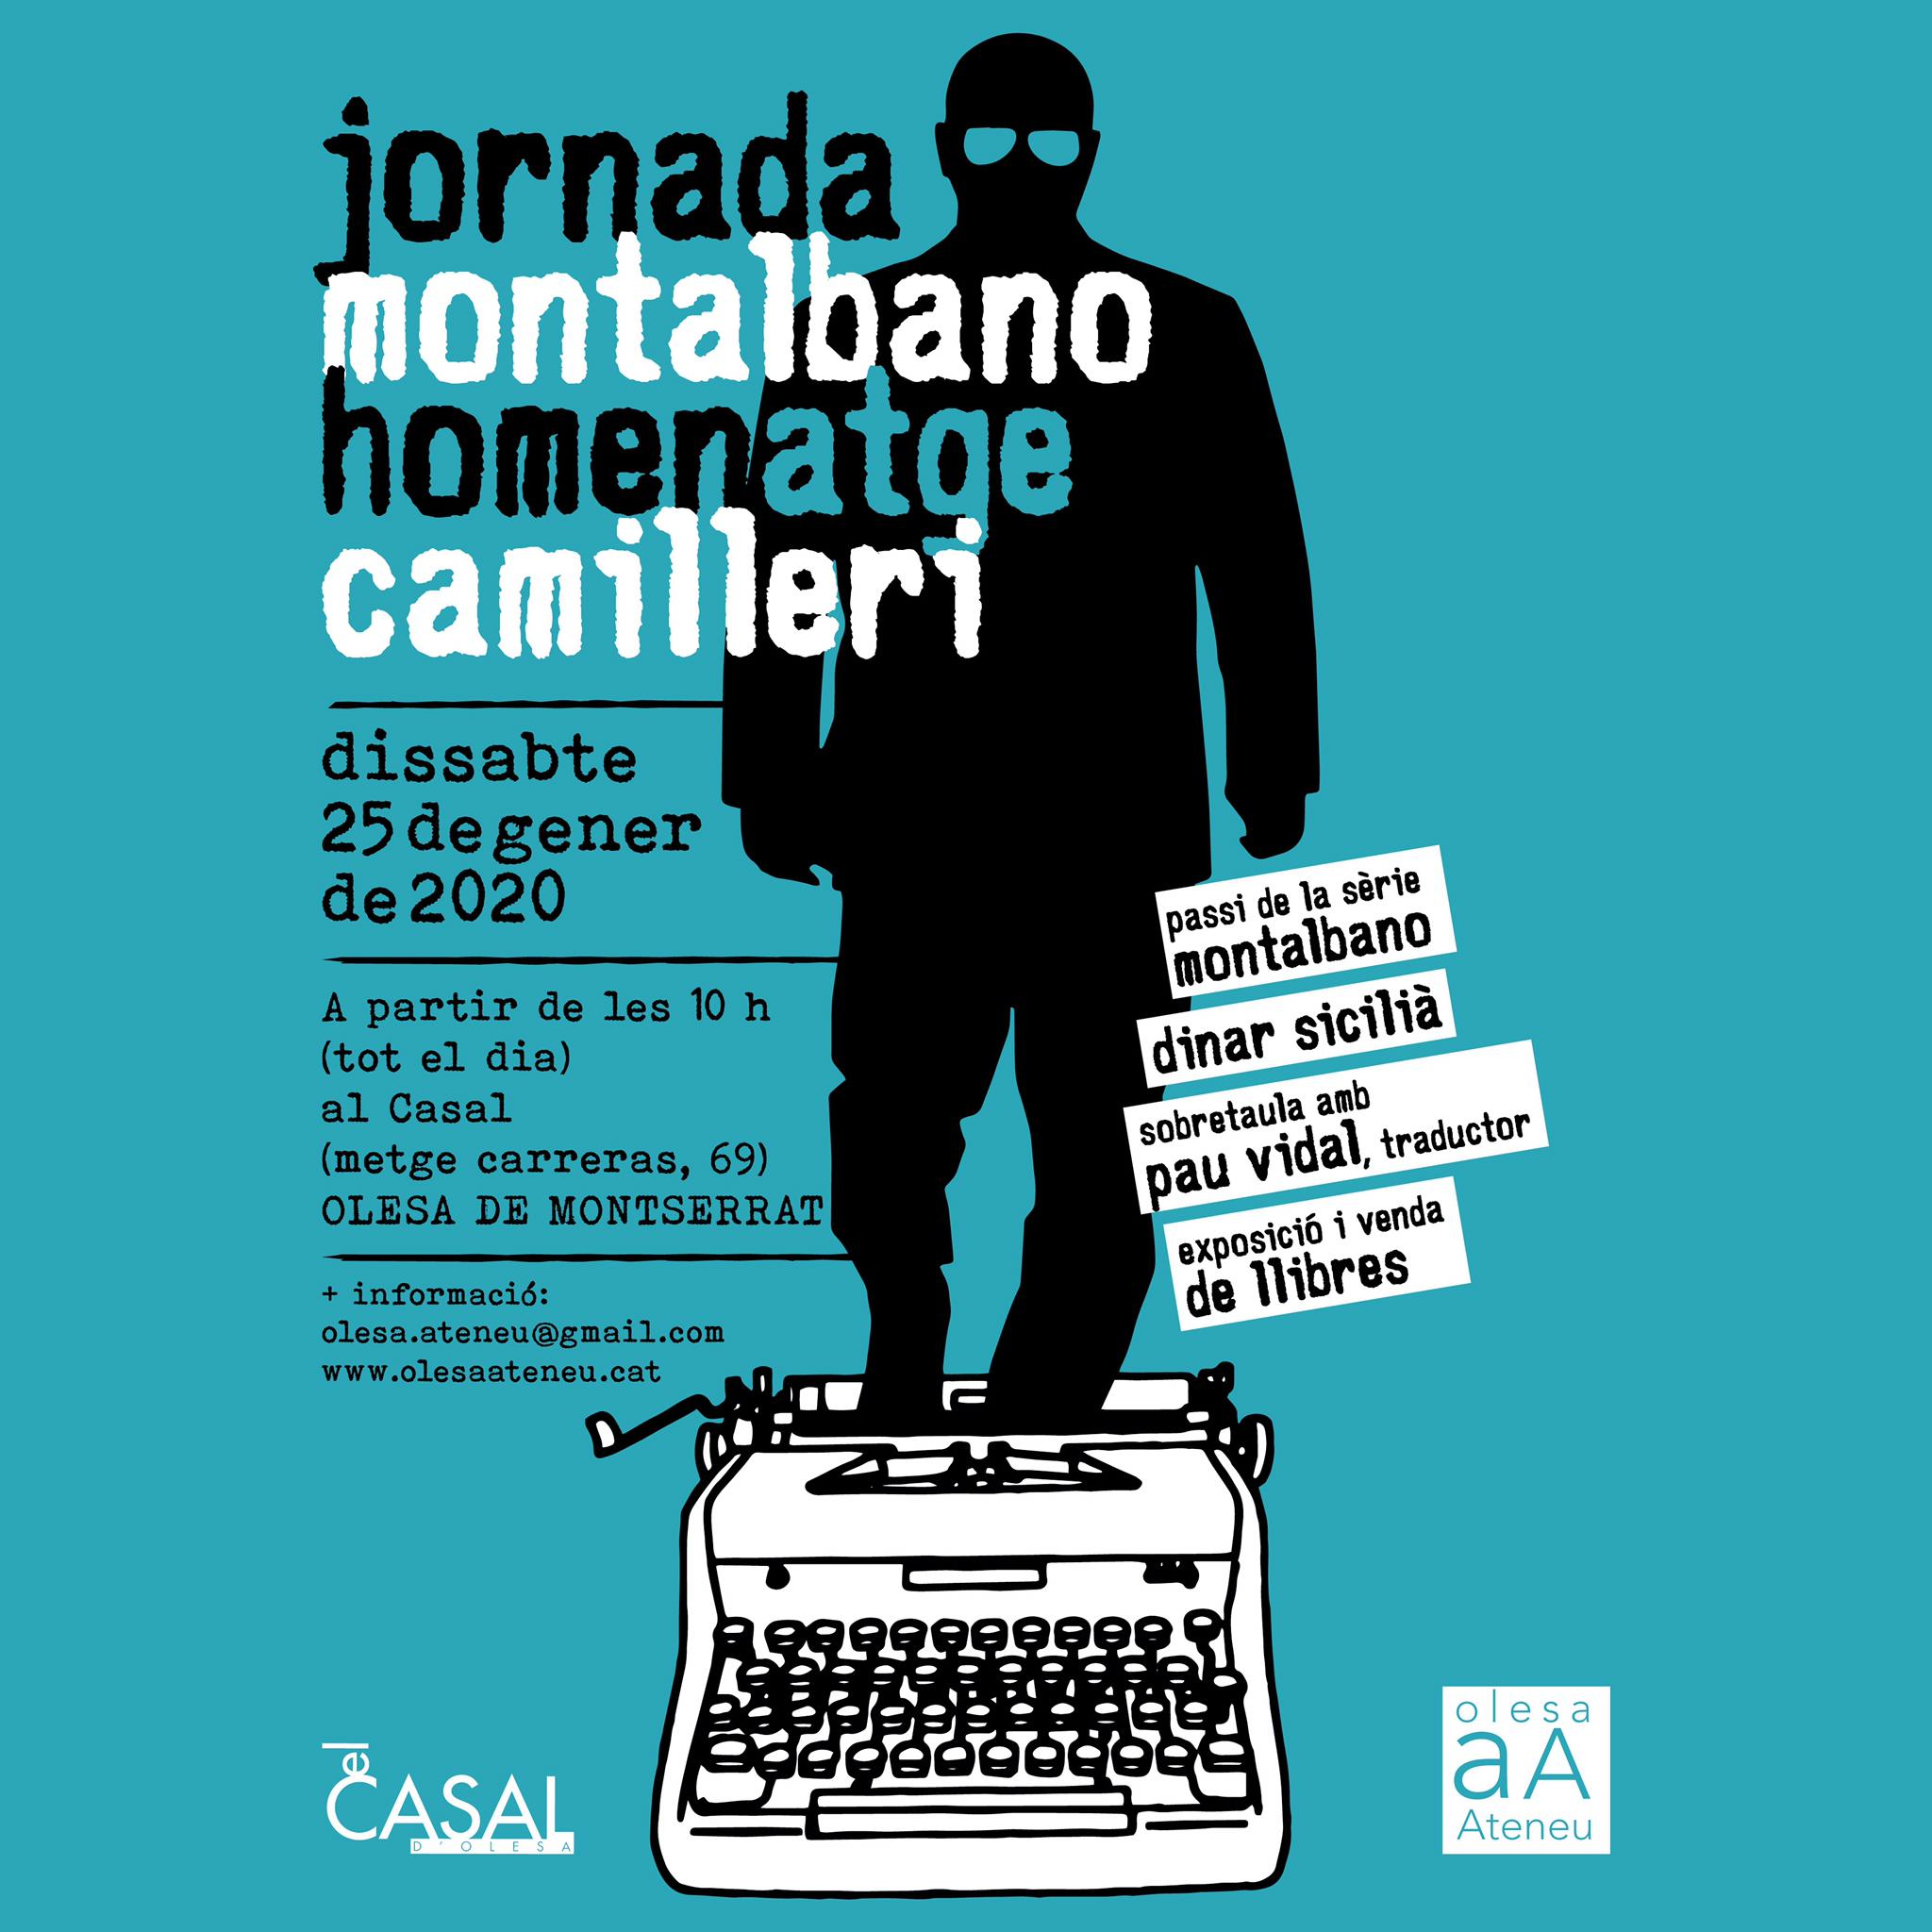 Jornada homenatge a Motalbano Camilleri